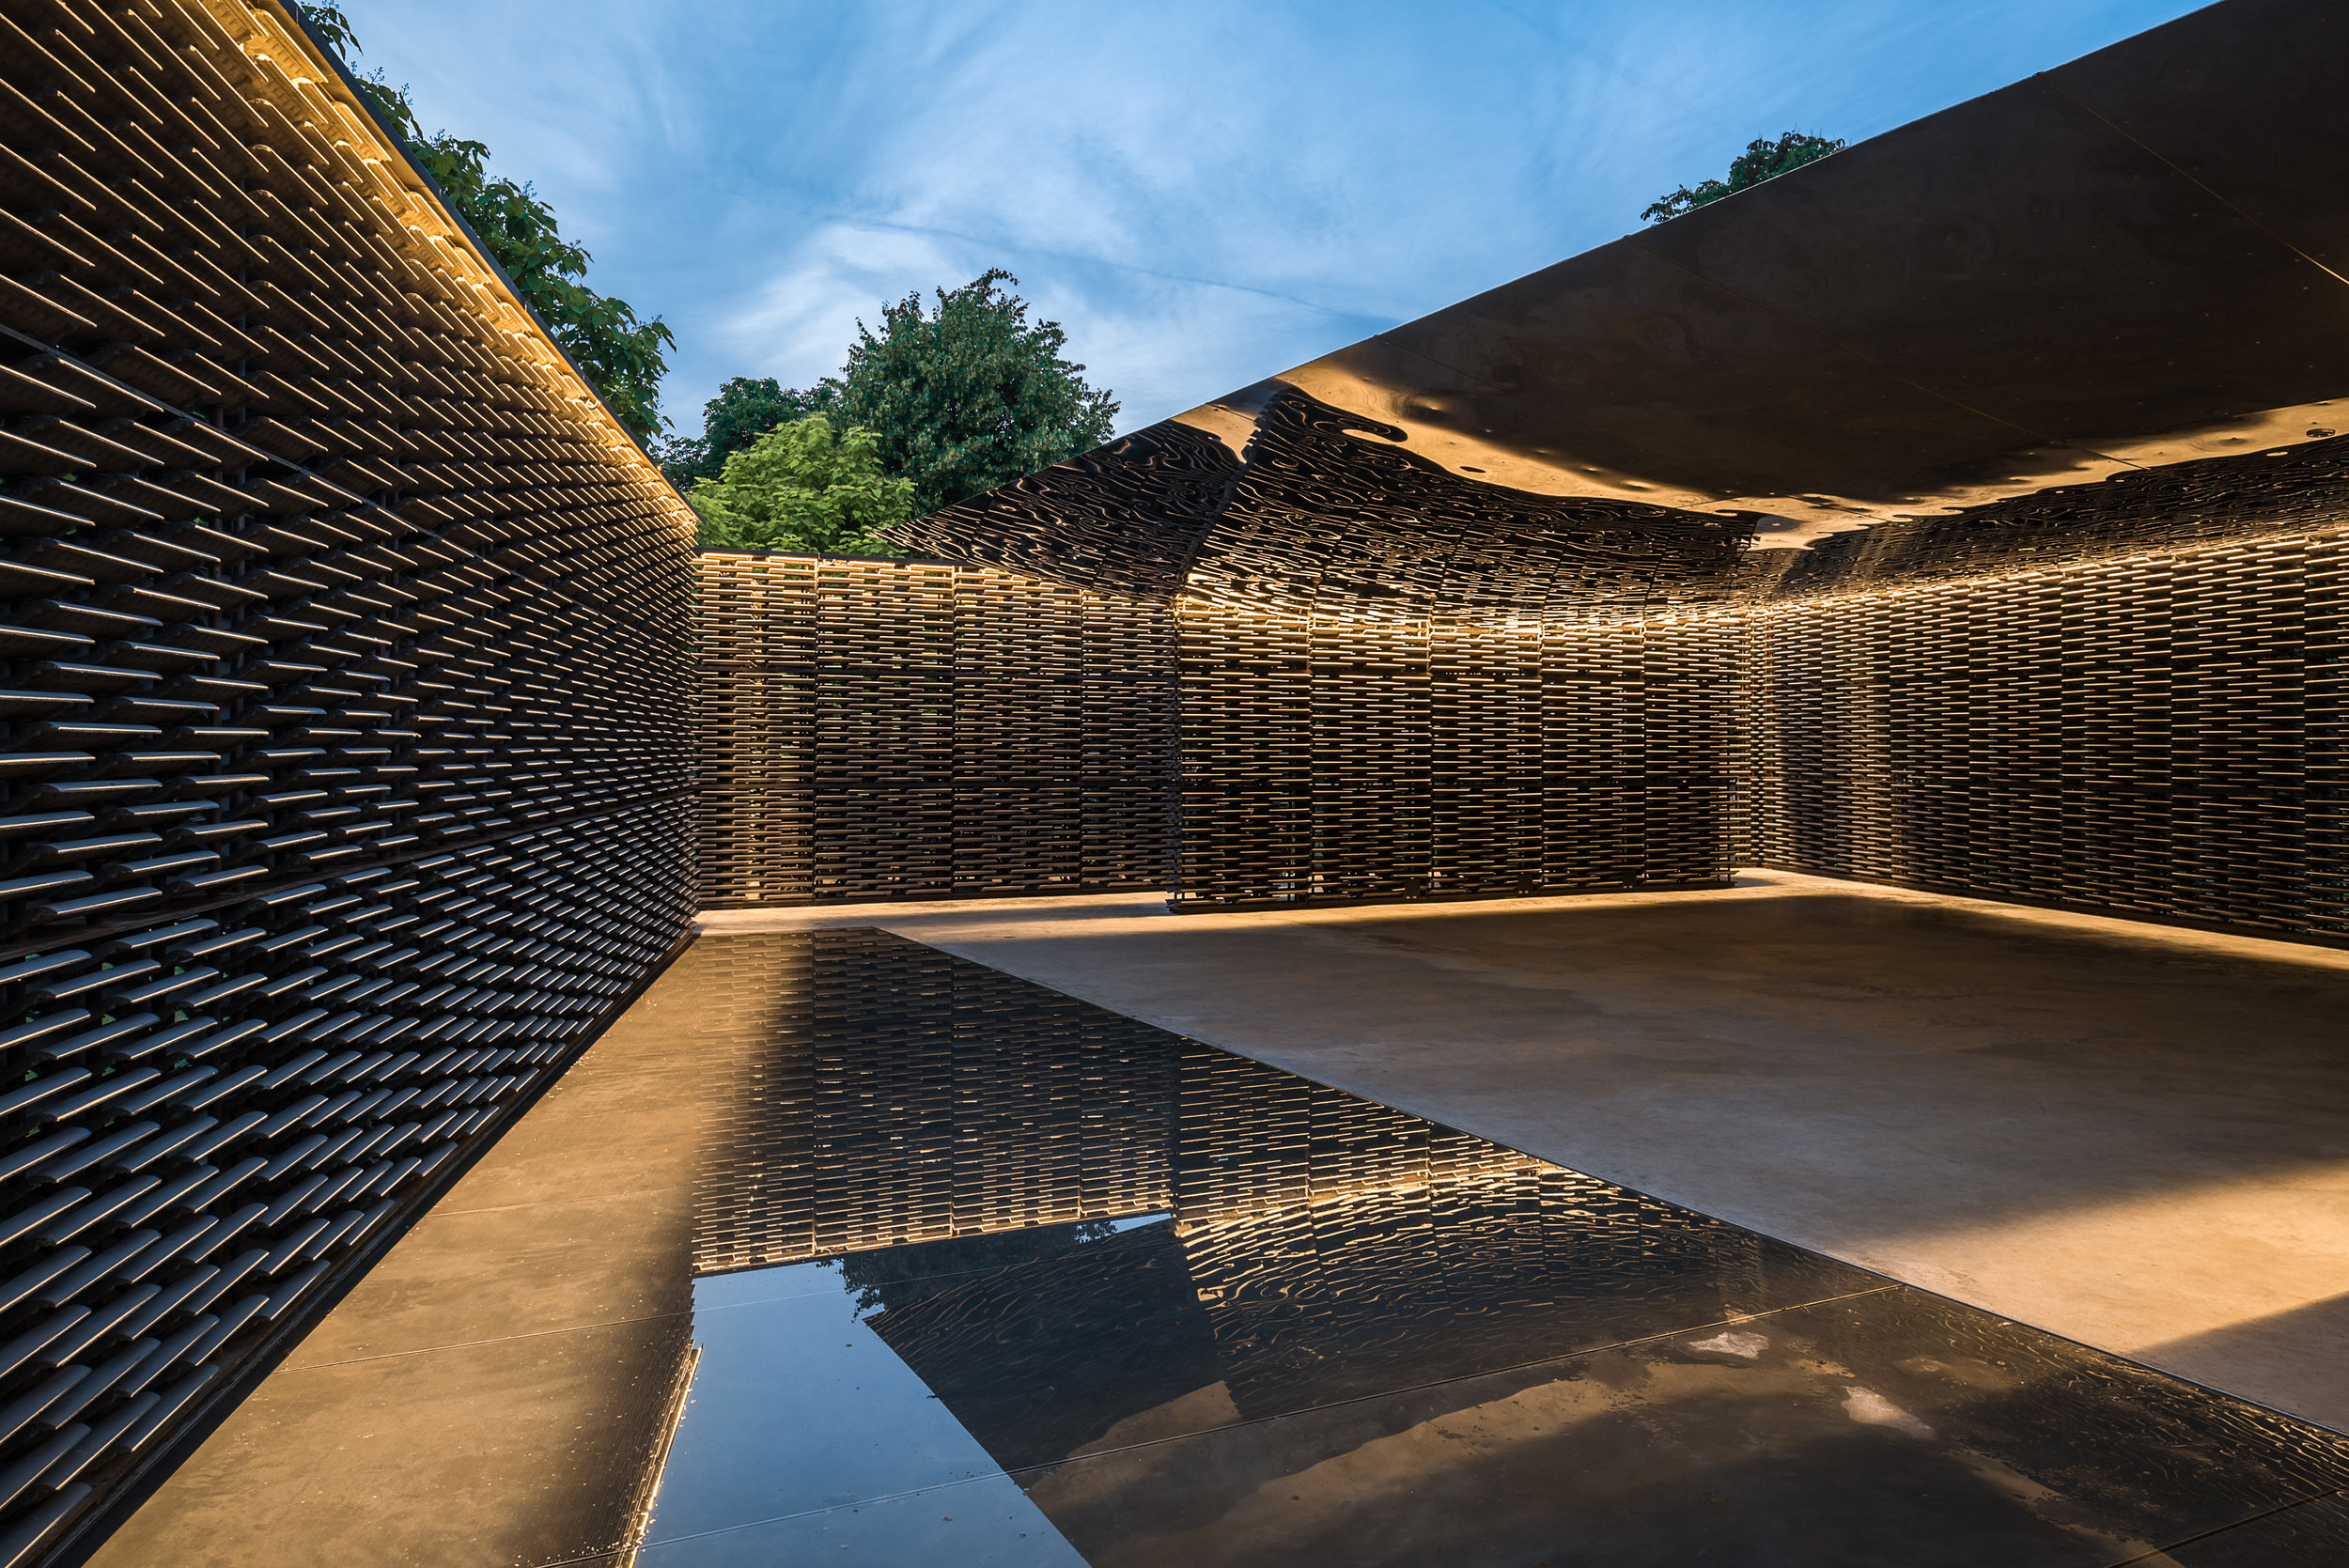 serpentine-pavilion-2018-architectural-photography